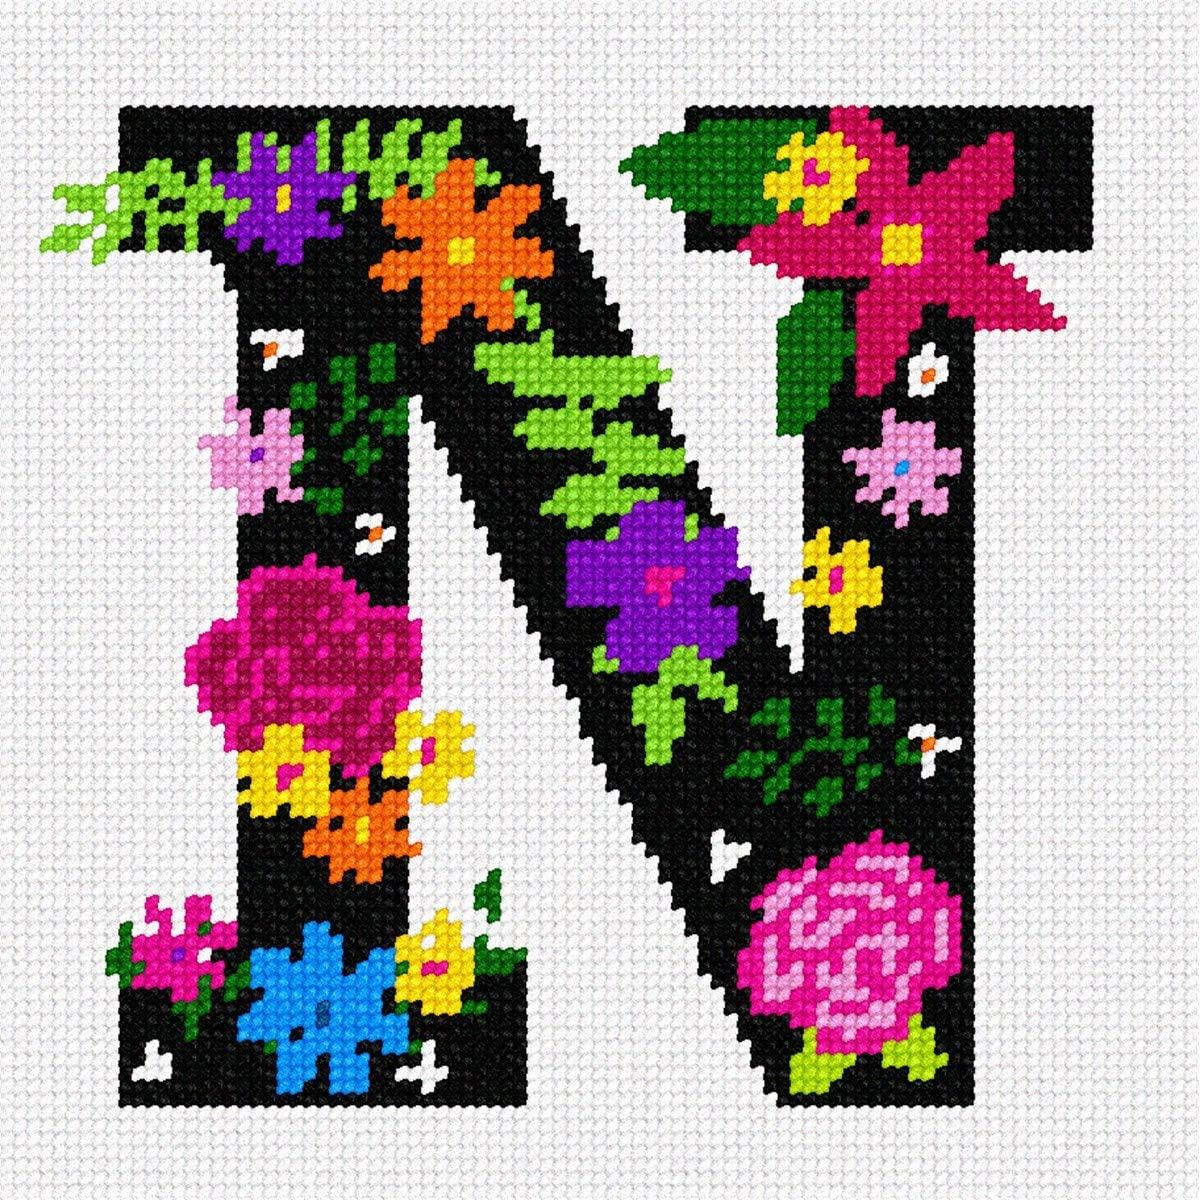 pepita Letter N Primary Floral Needlepoint Kit